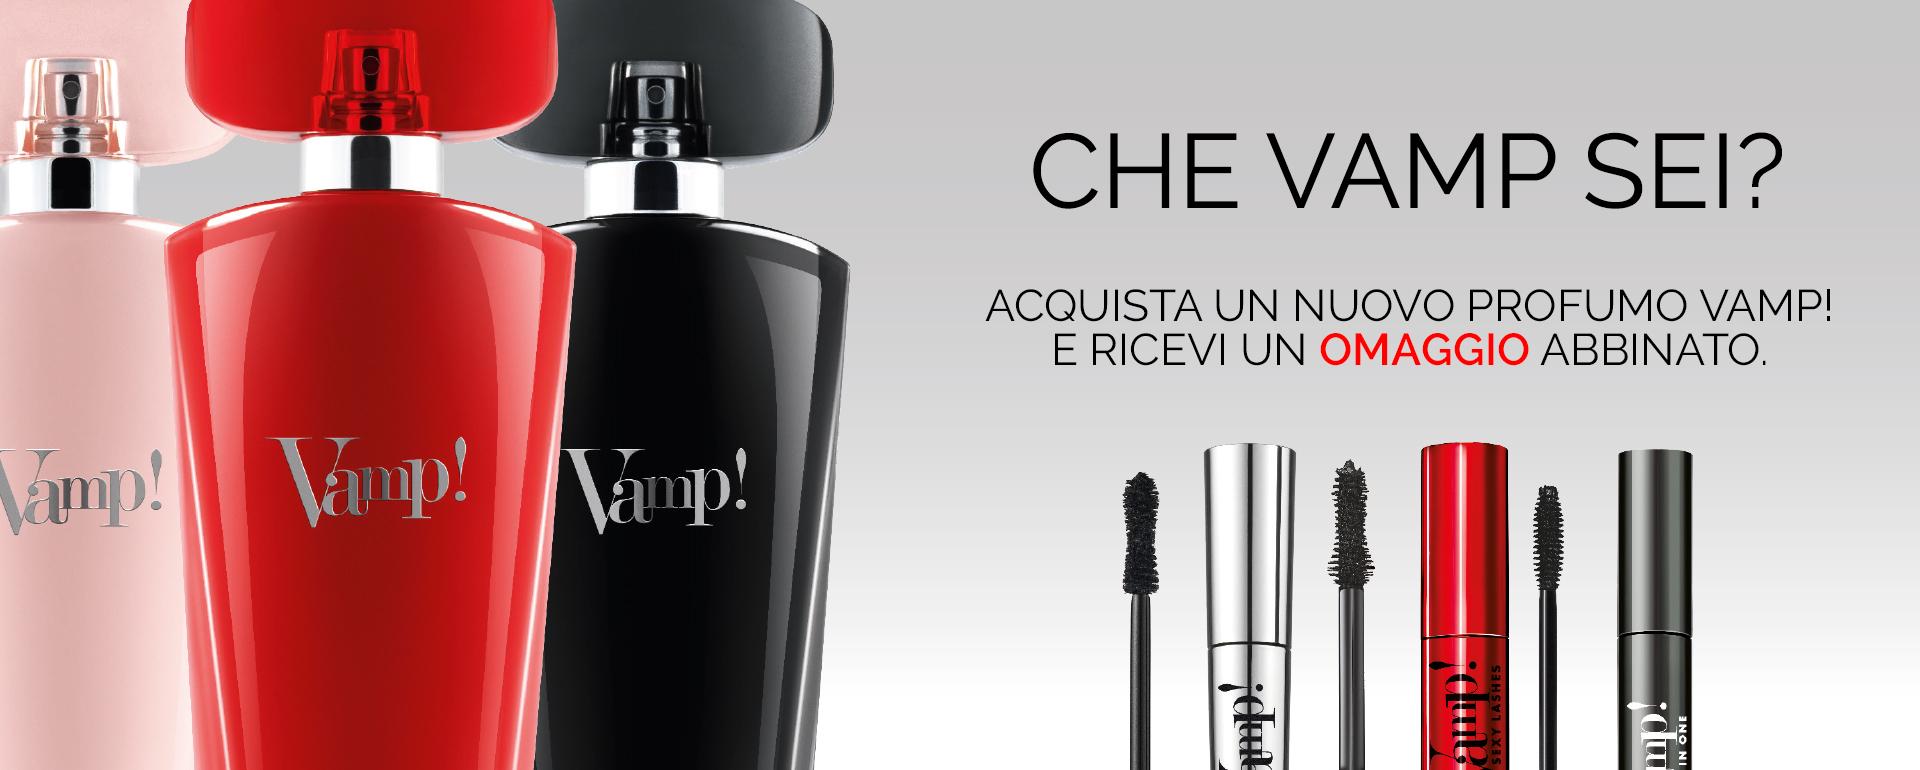 Promo EDP Vamp! - PUPA Milano